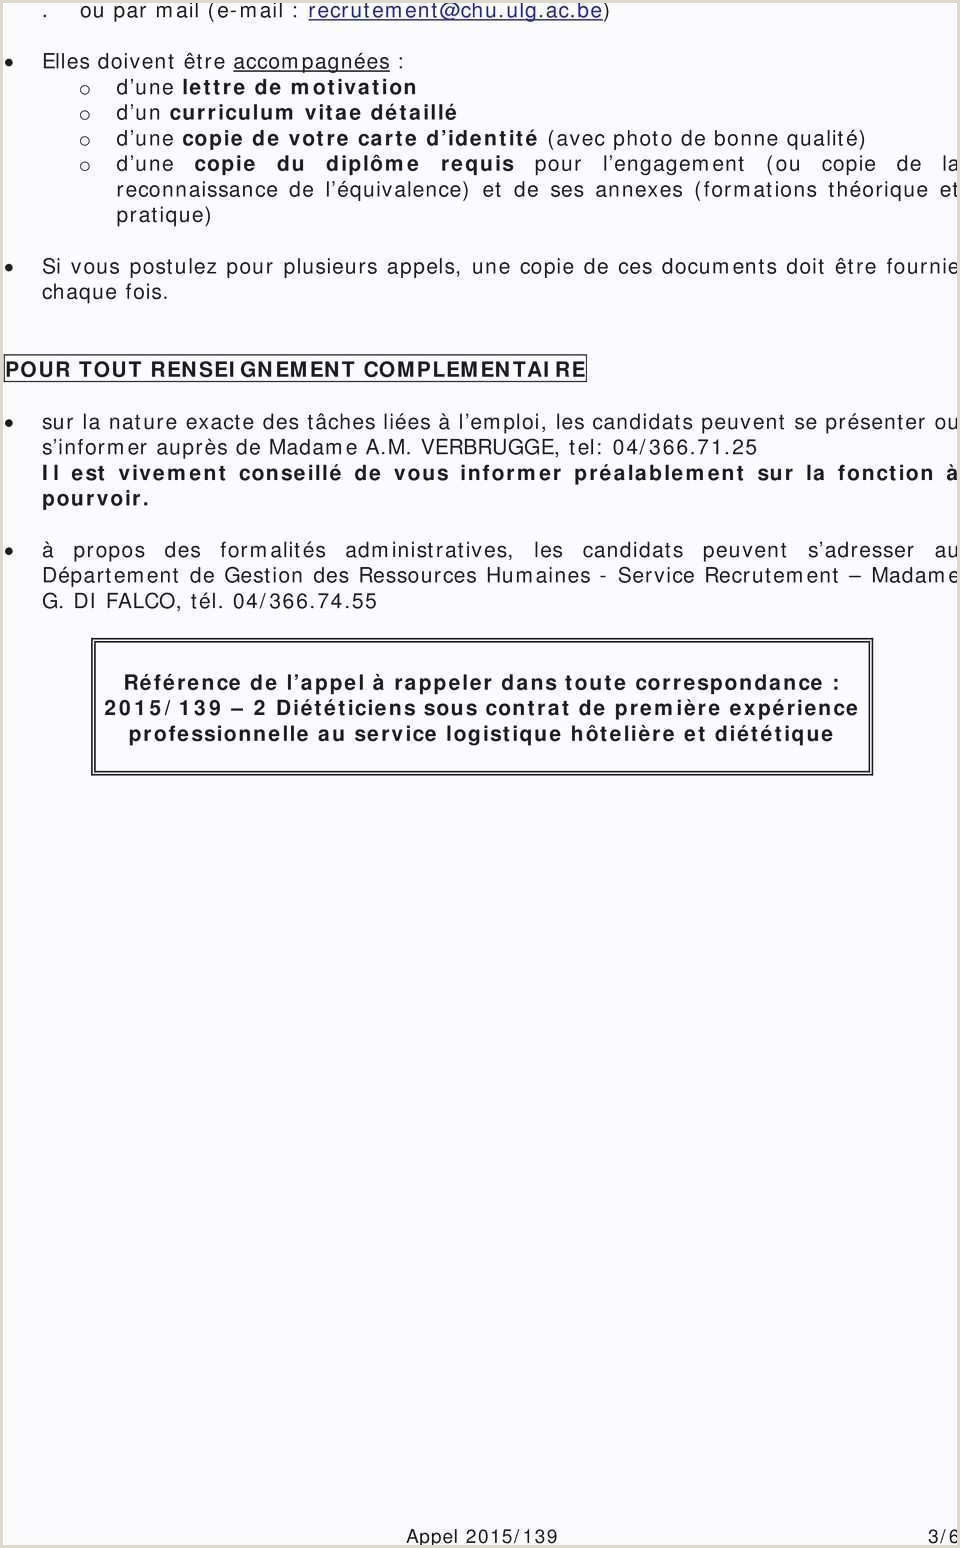 Curriculo Simples E Rapido 33 Modele Lettre Resiliation Contrat Telesurveillance